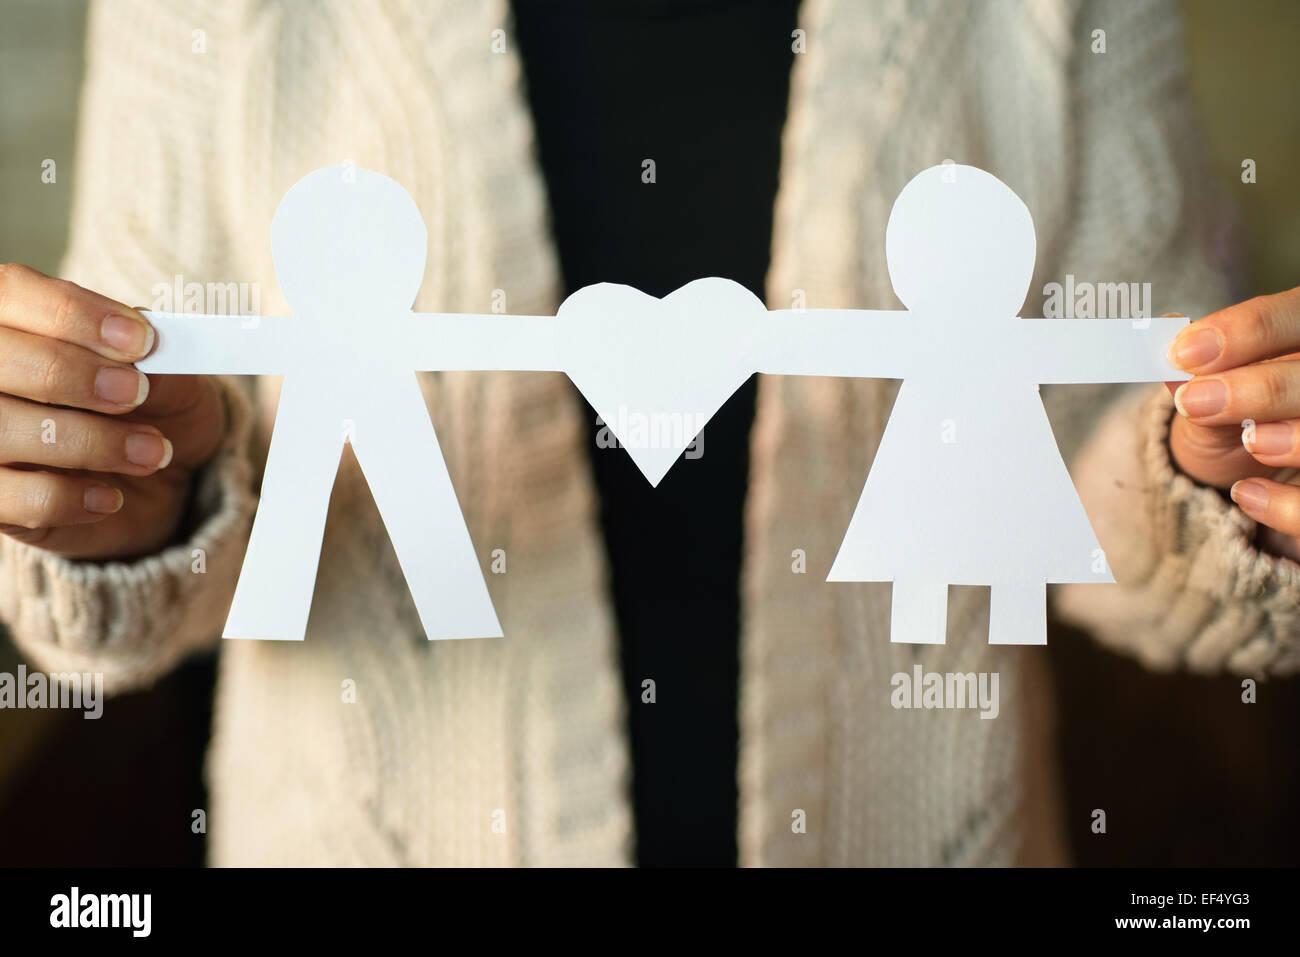 Dos hombres de papel con forma de corazón Imagen De Stock